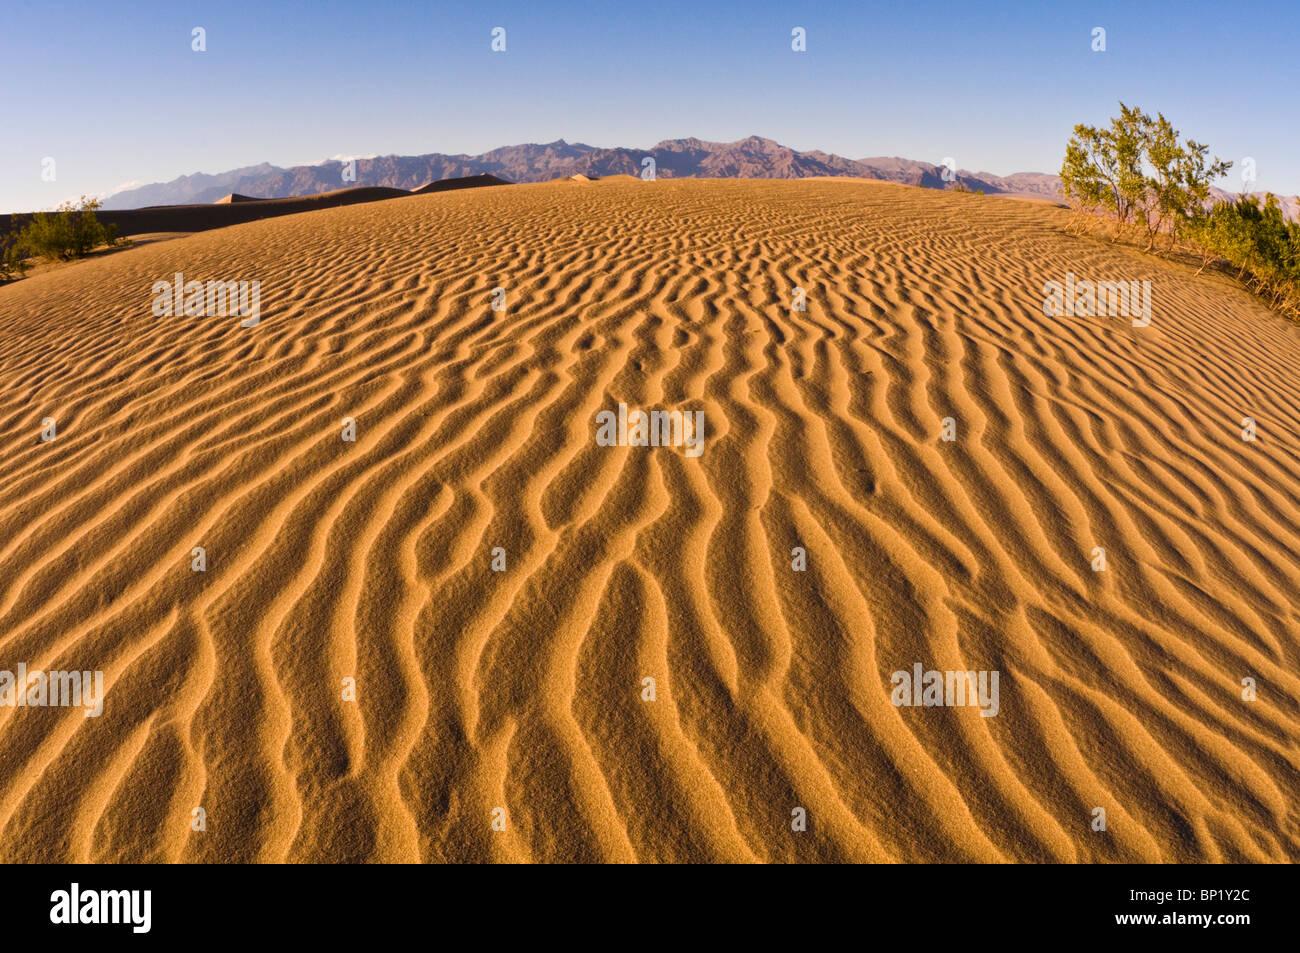 Evening light on dune patterns, Mesquite Flat Sand Dunes, Death Valley National Park. California - Stock Image